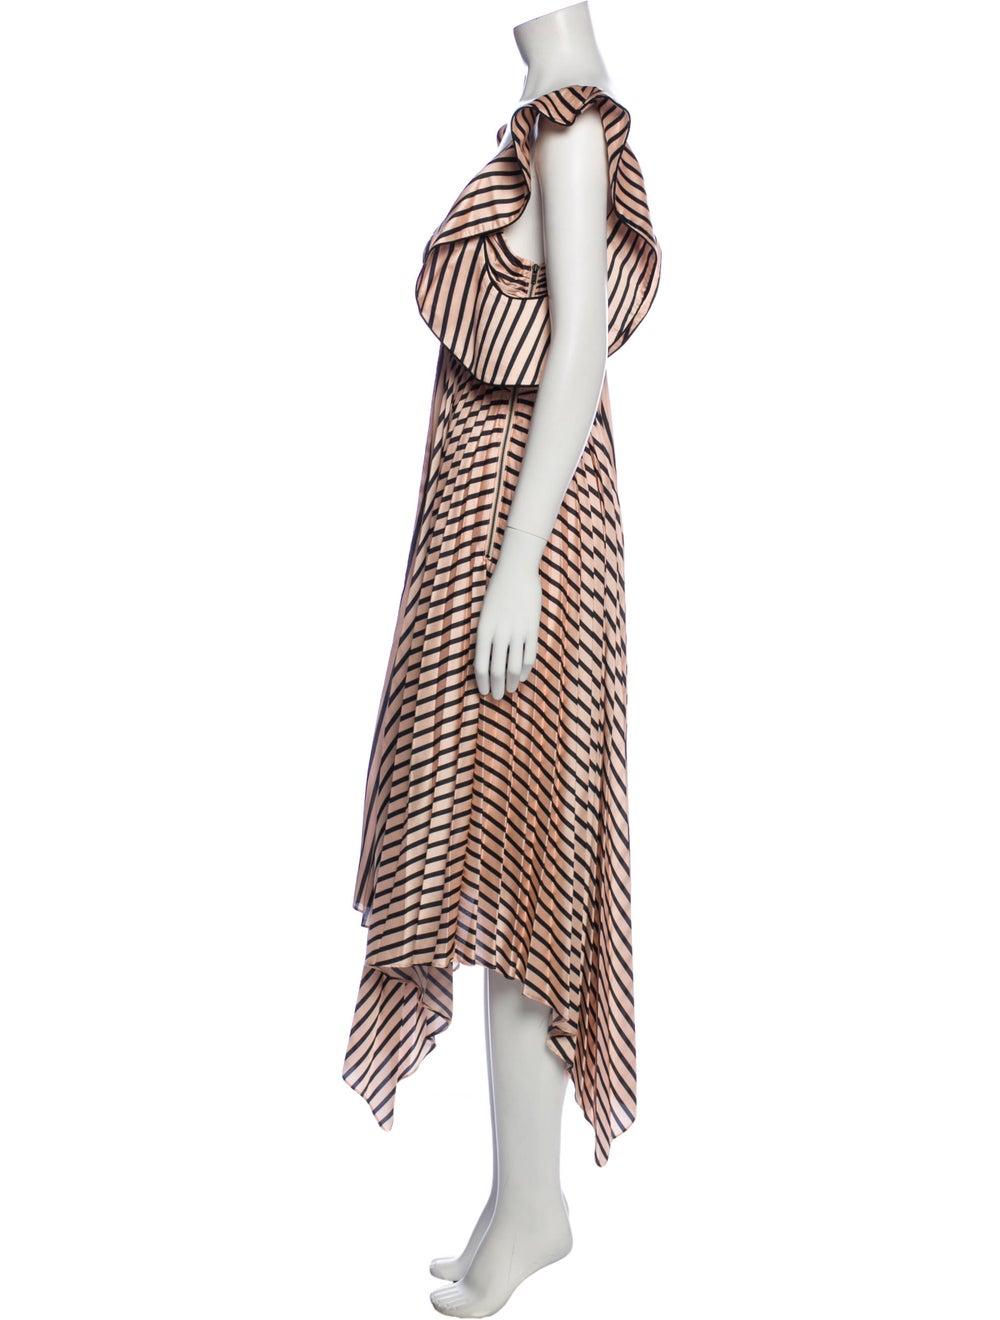 Self-Portrait Striped Long Dress - image 2